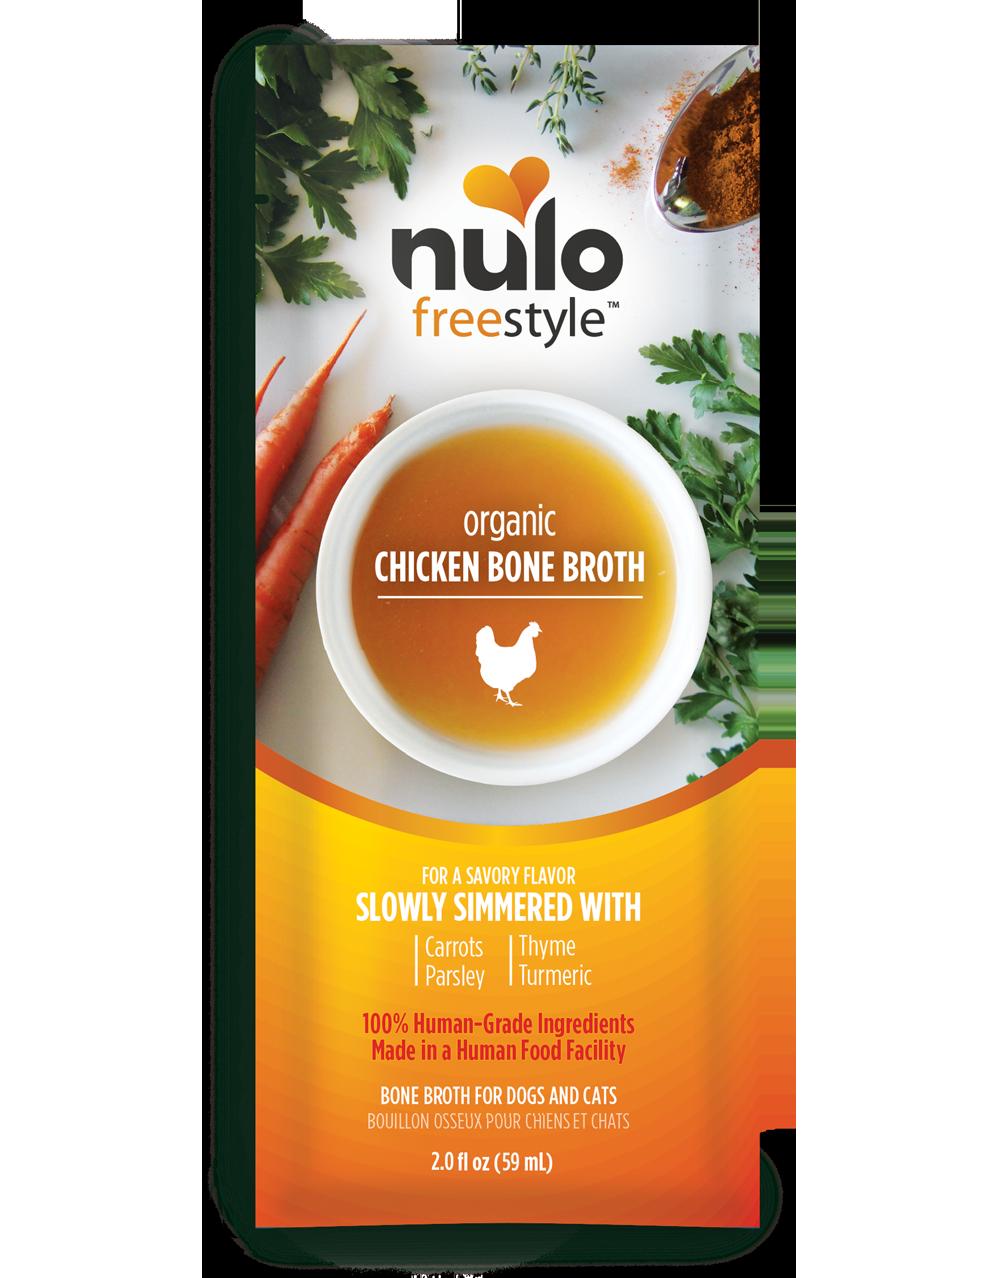 Nulo Freestyle Bone Broth Organic Chicken Dog & Cat Food Topper, 2-oz (Size: 2-oz) Image